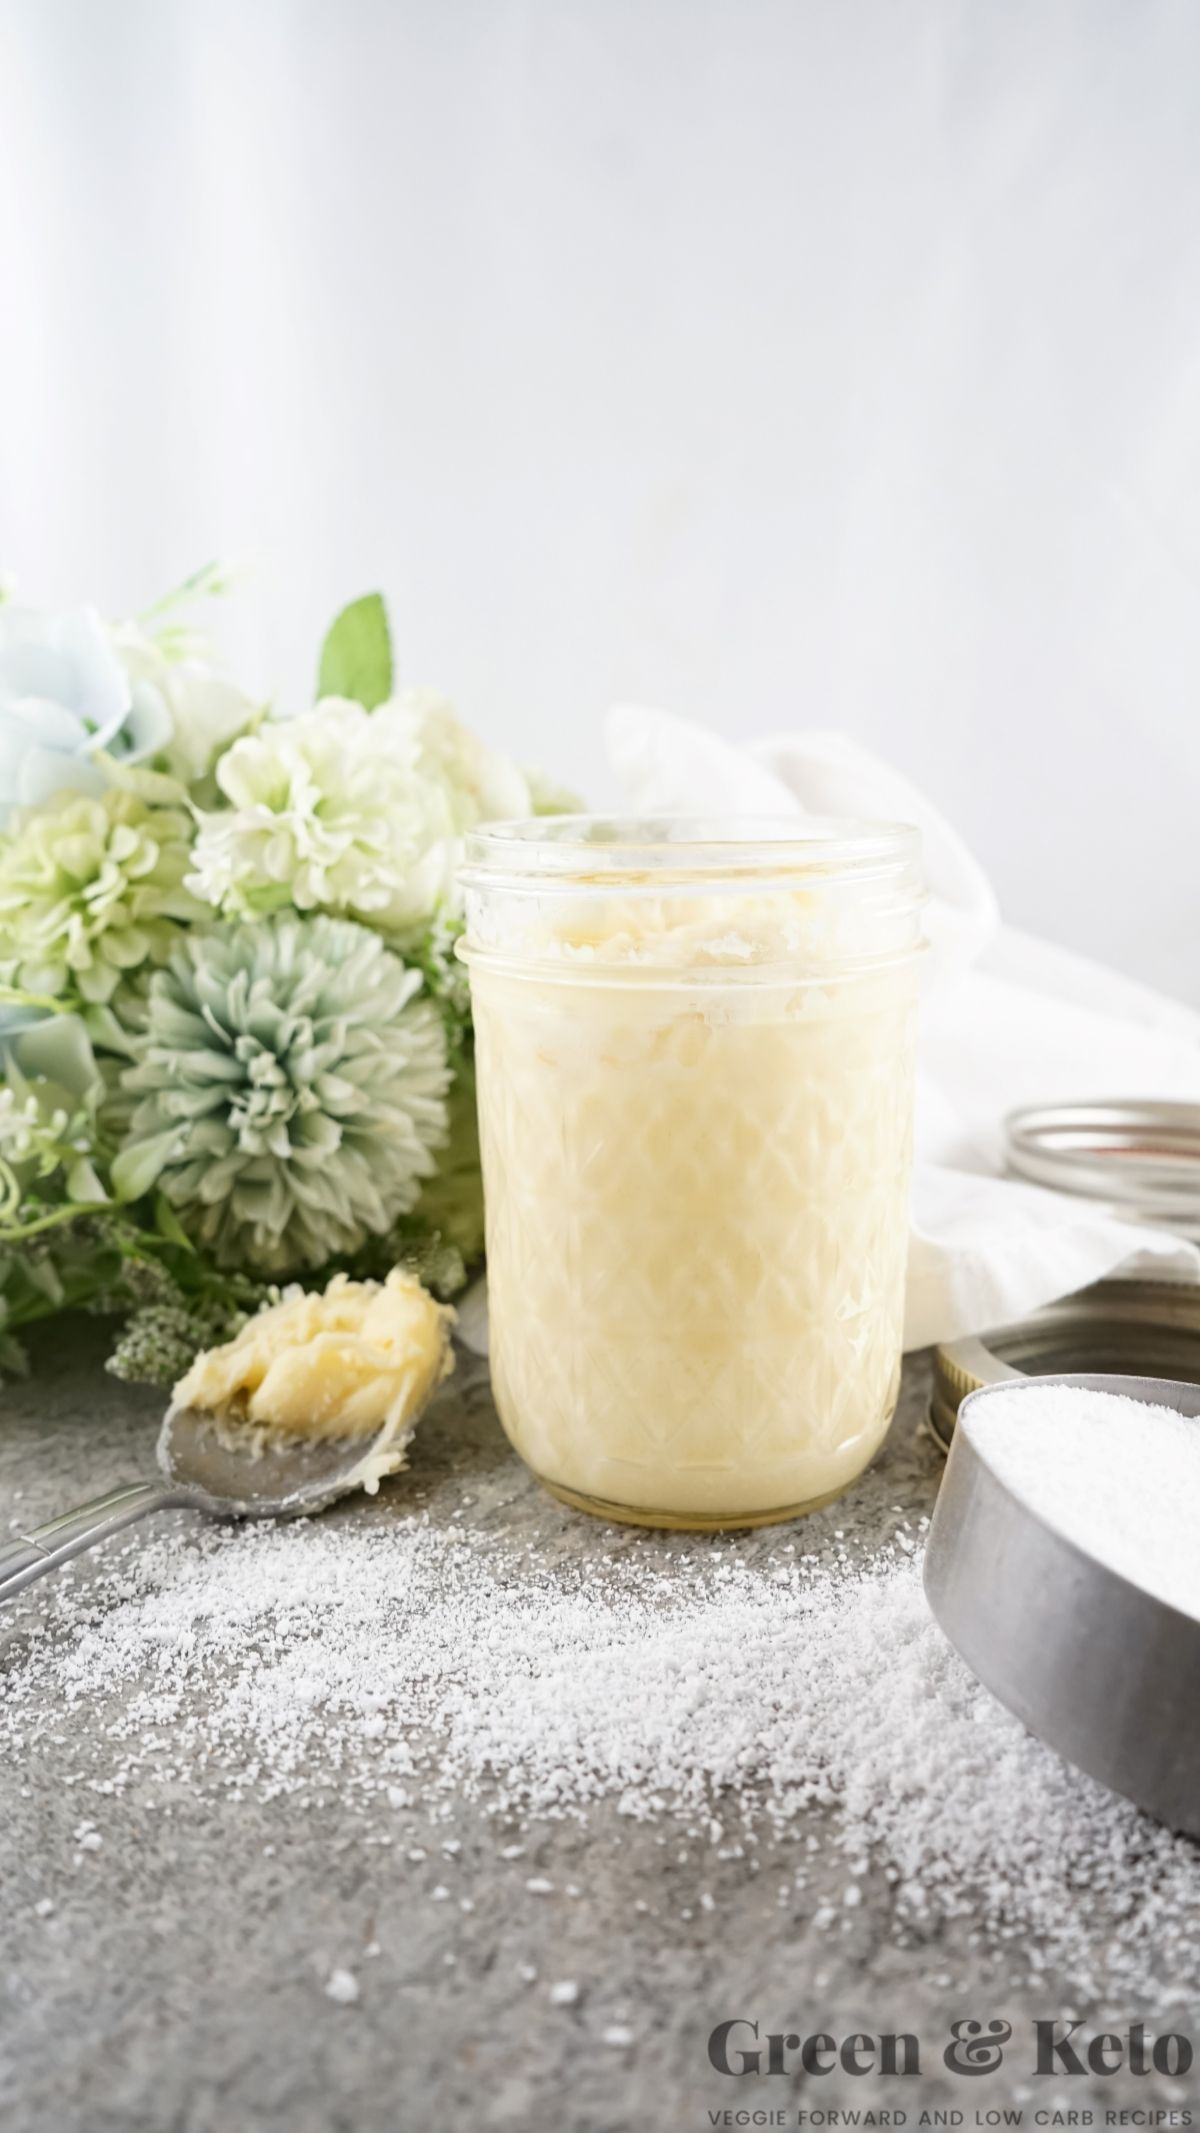 Sugar free condensed milk